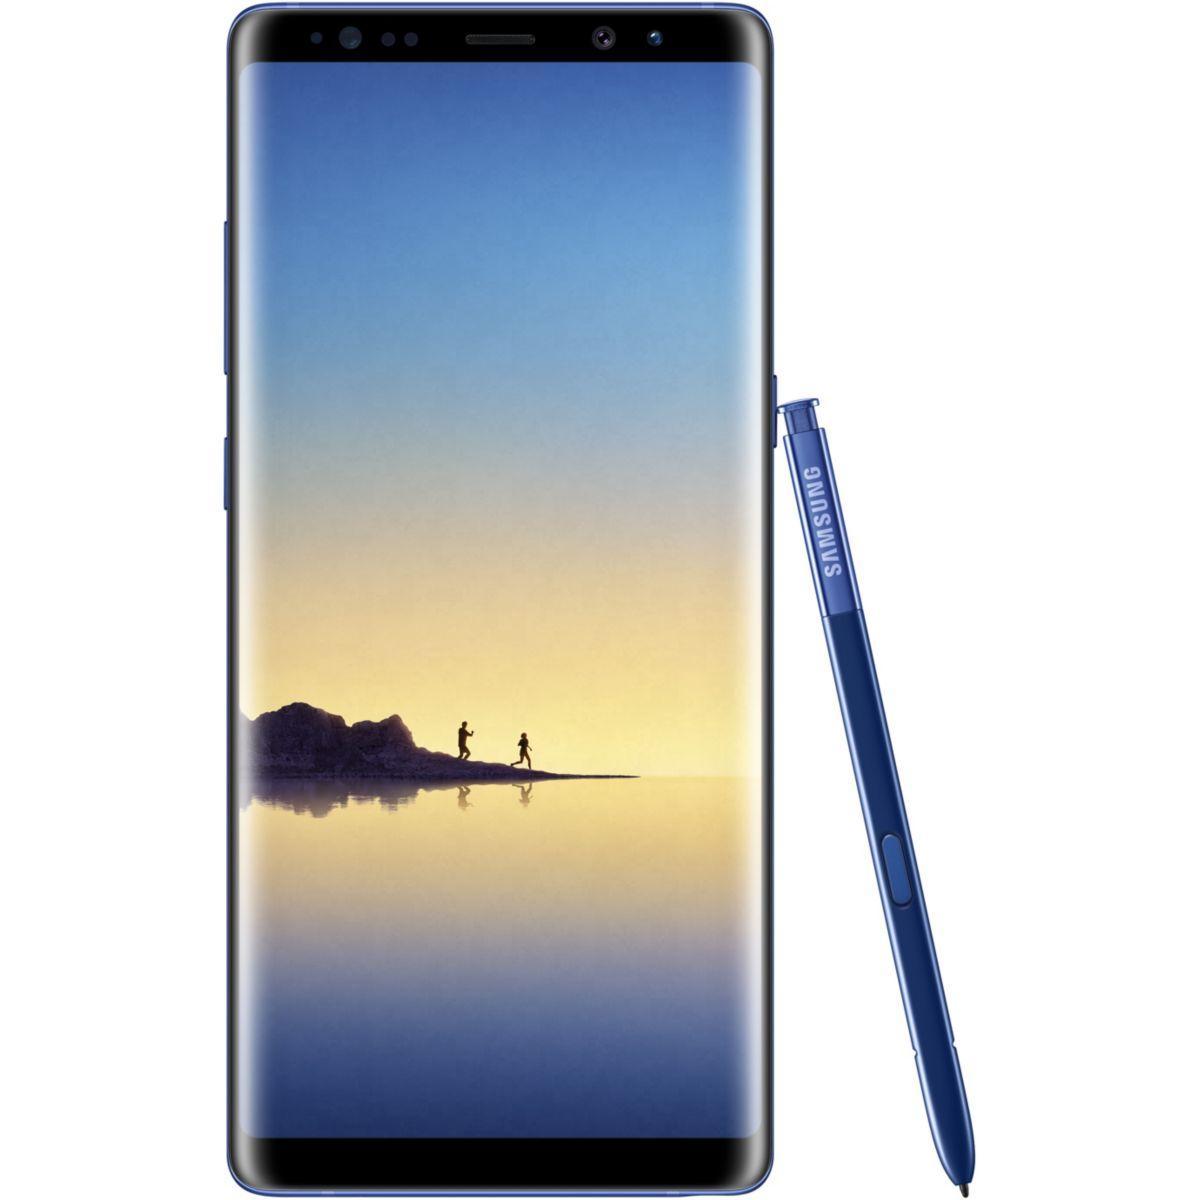 Smartphone samsung galaxy note 8 bleu - 2% de remise imm�diate avec le code : deal2